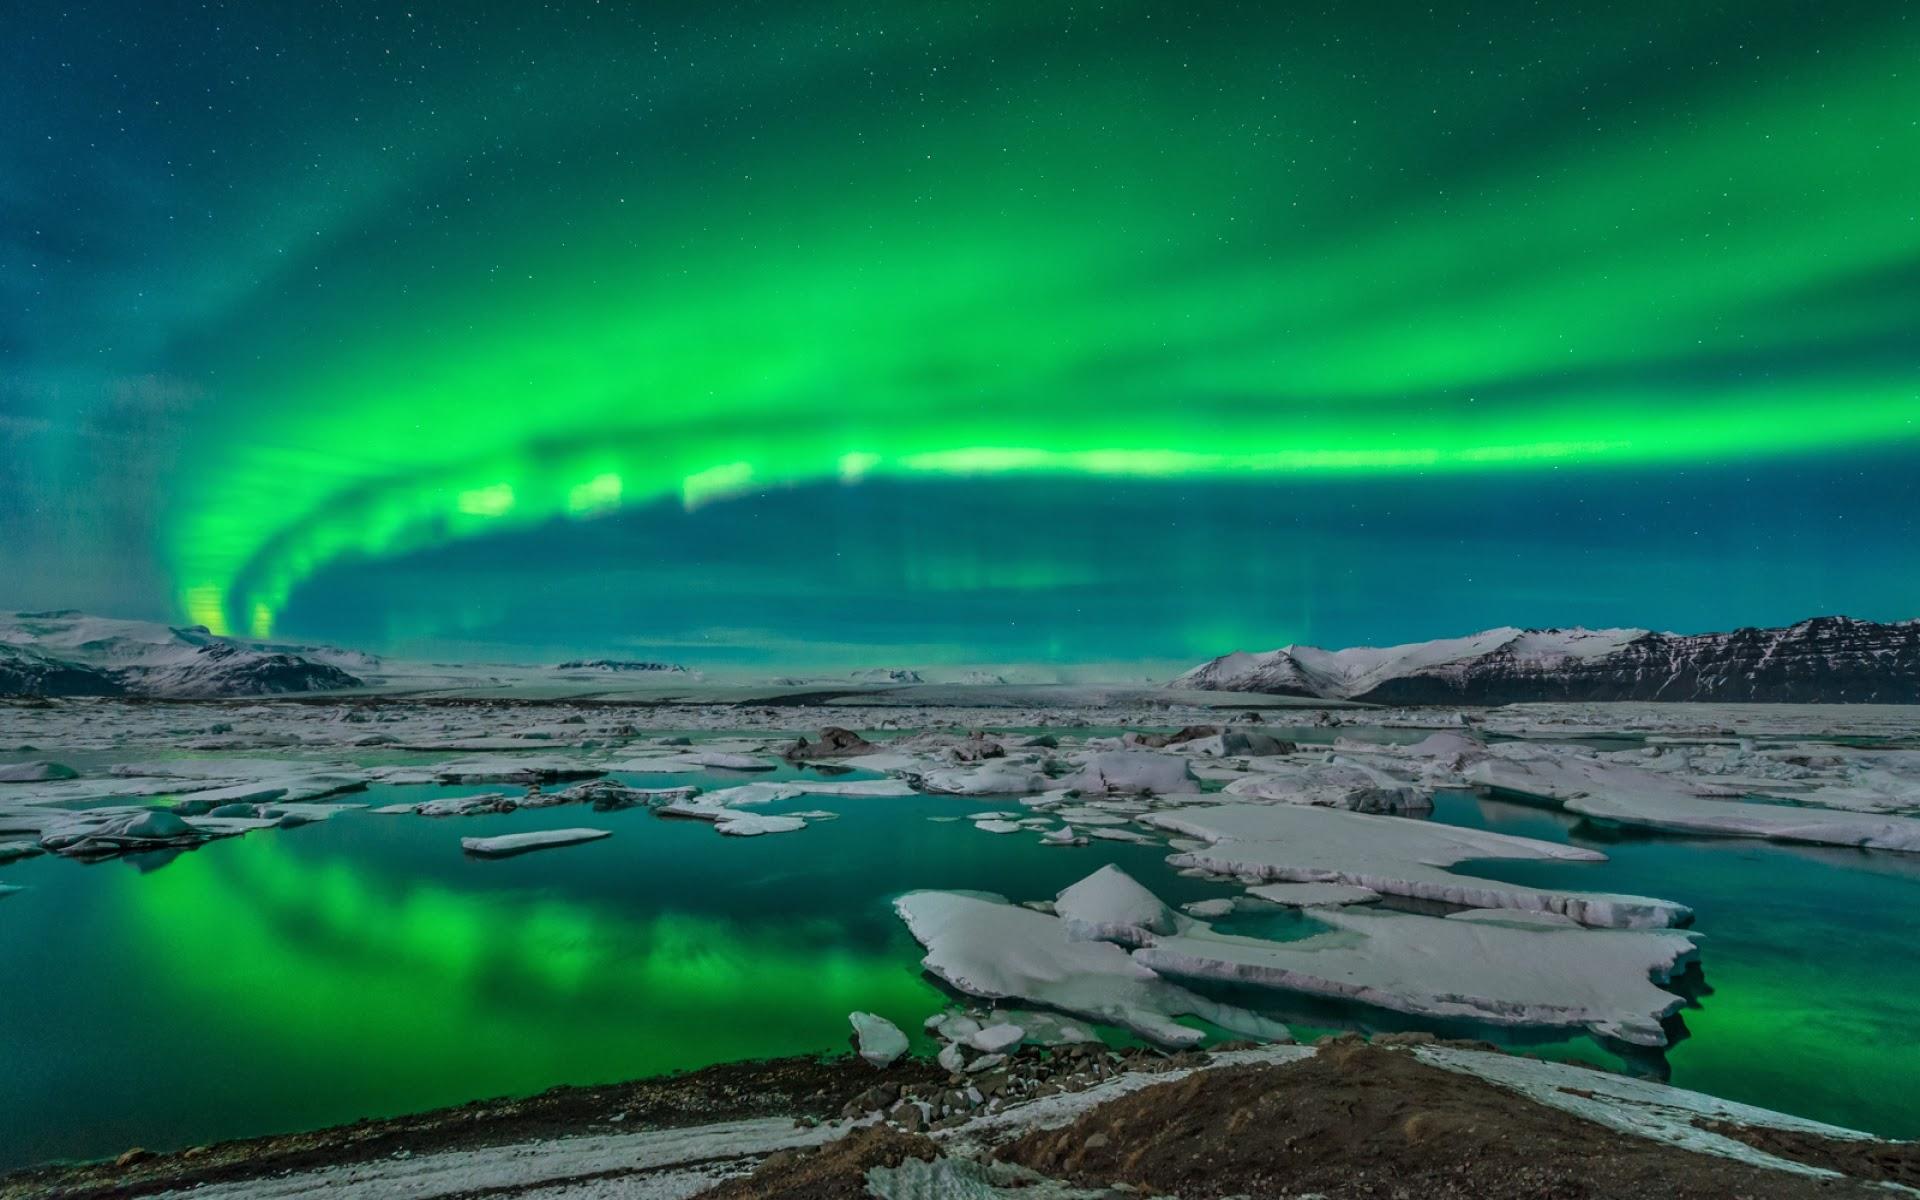 Home » Landscape » Others » Sun & Sky » Aurora Borealis Wallpaper